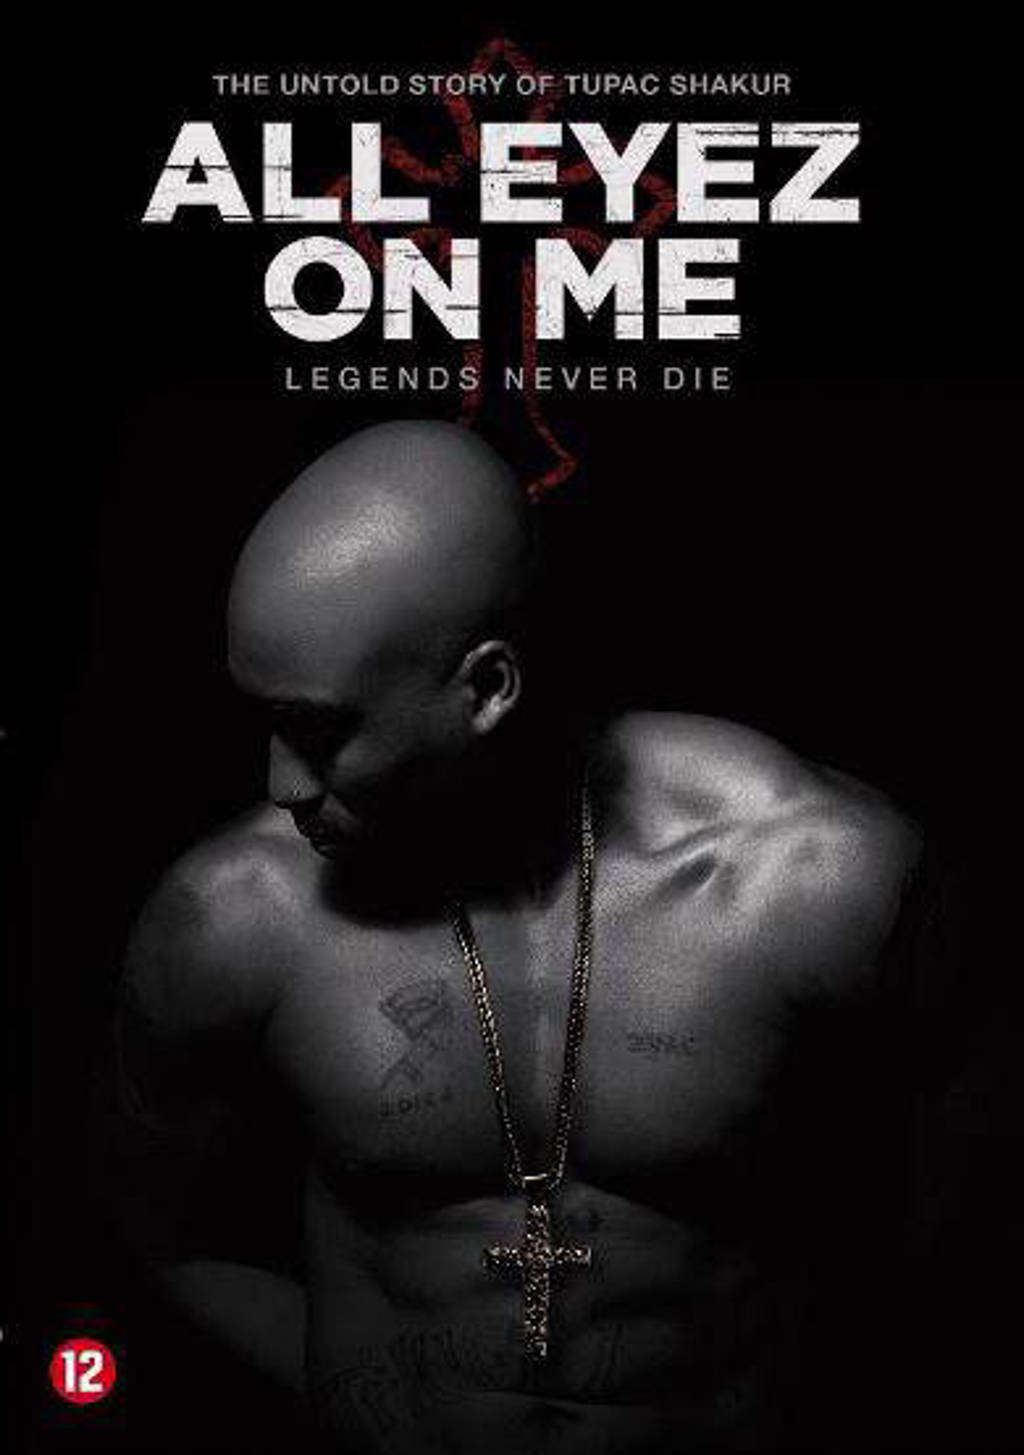 All eyez on me (DVD)